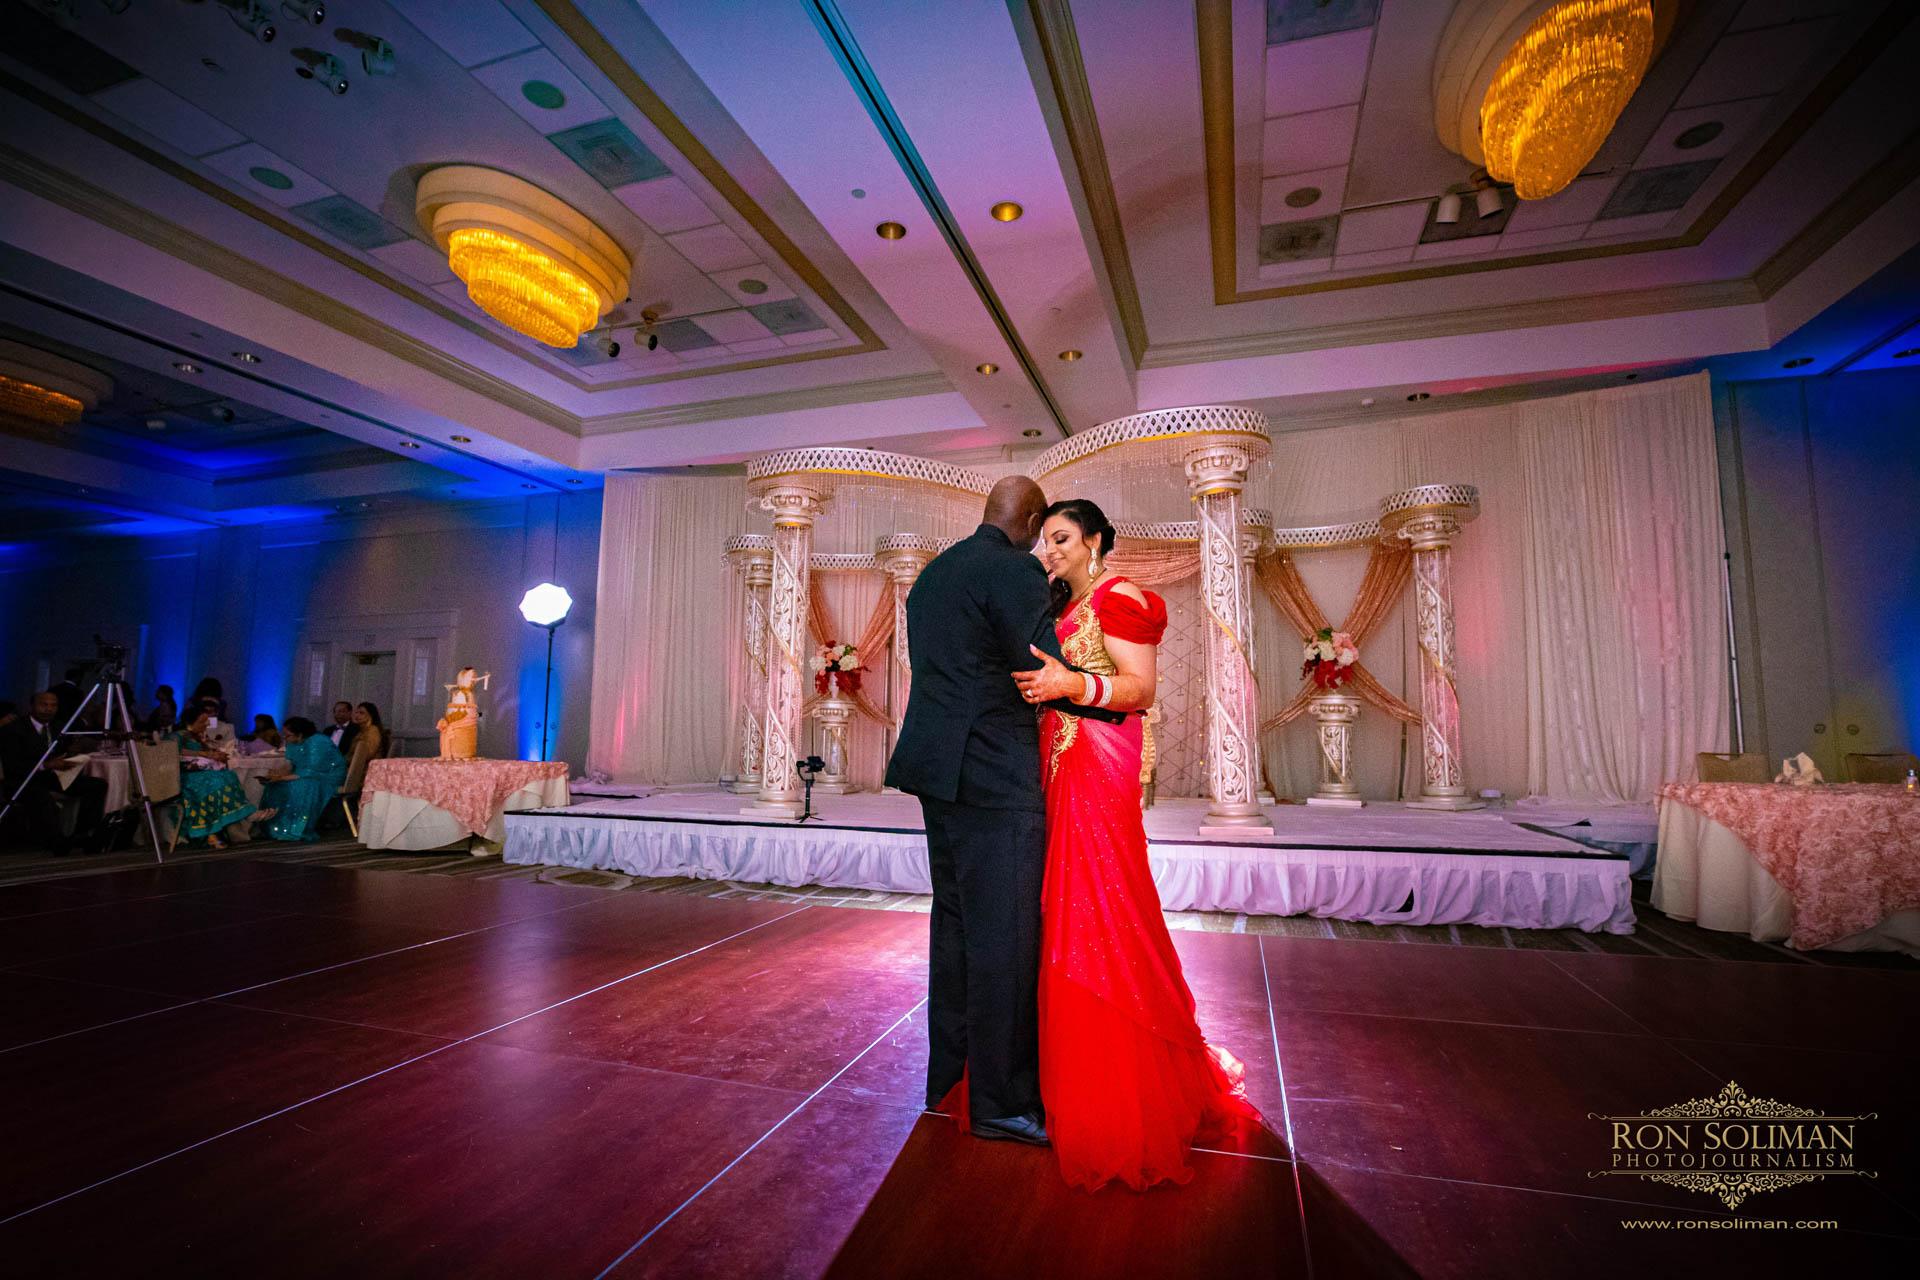 Gaithersburg Marriott Washingtonian Center Wedding 21